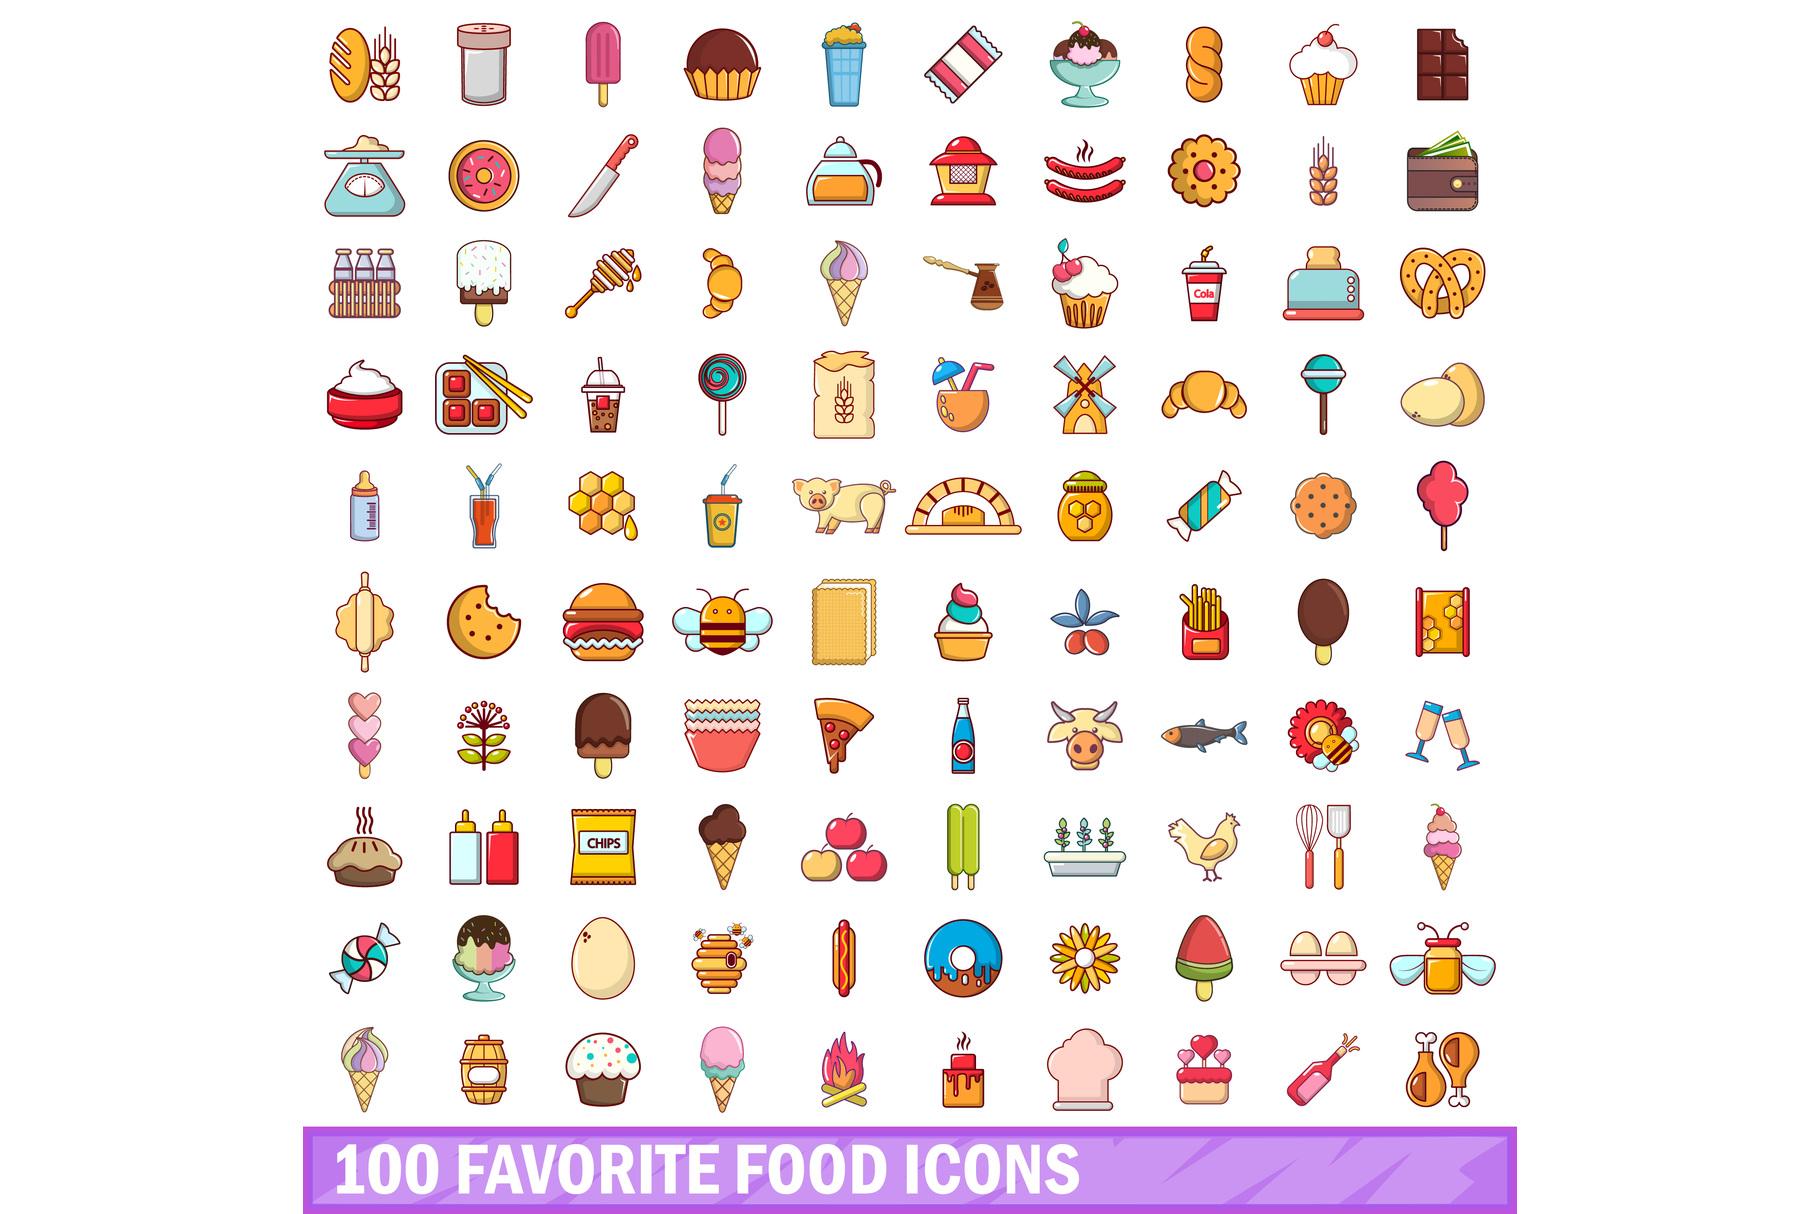 100 favorite food icons set, cartoon style example image 1